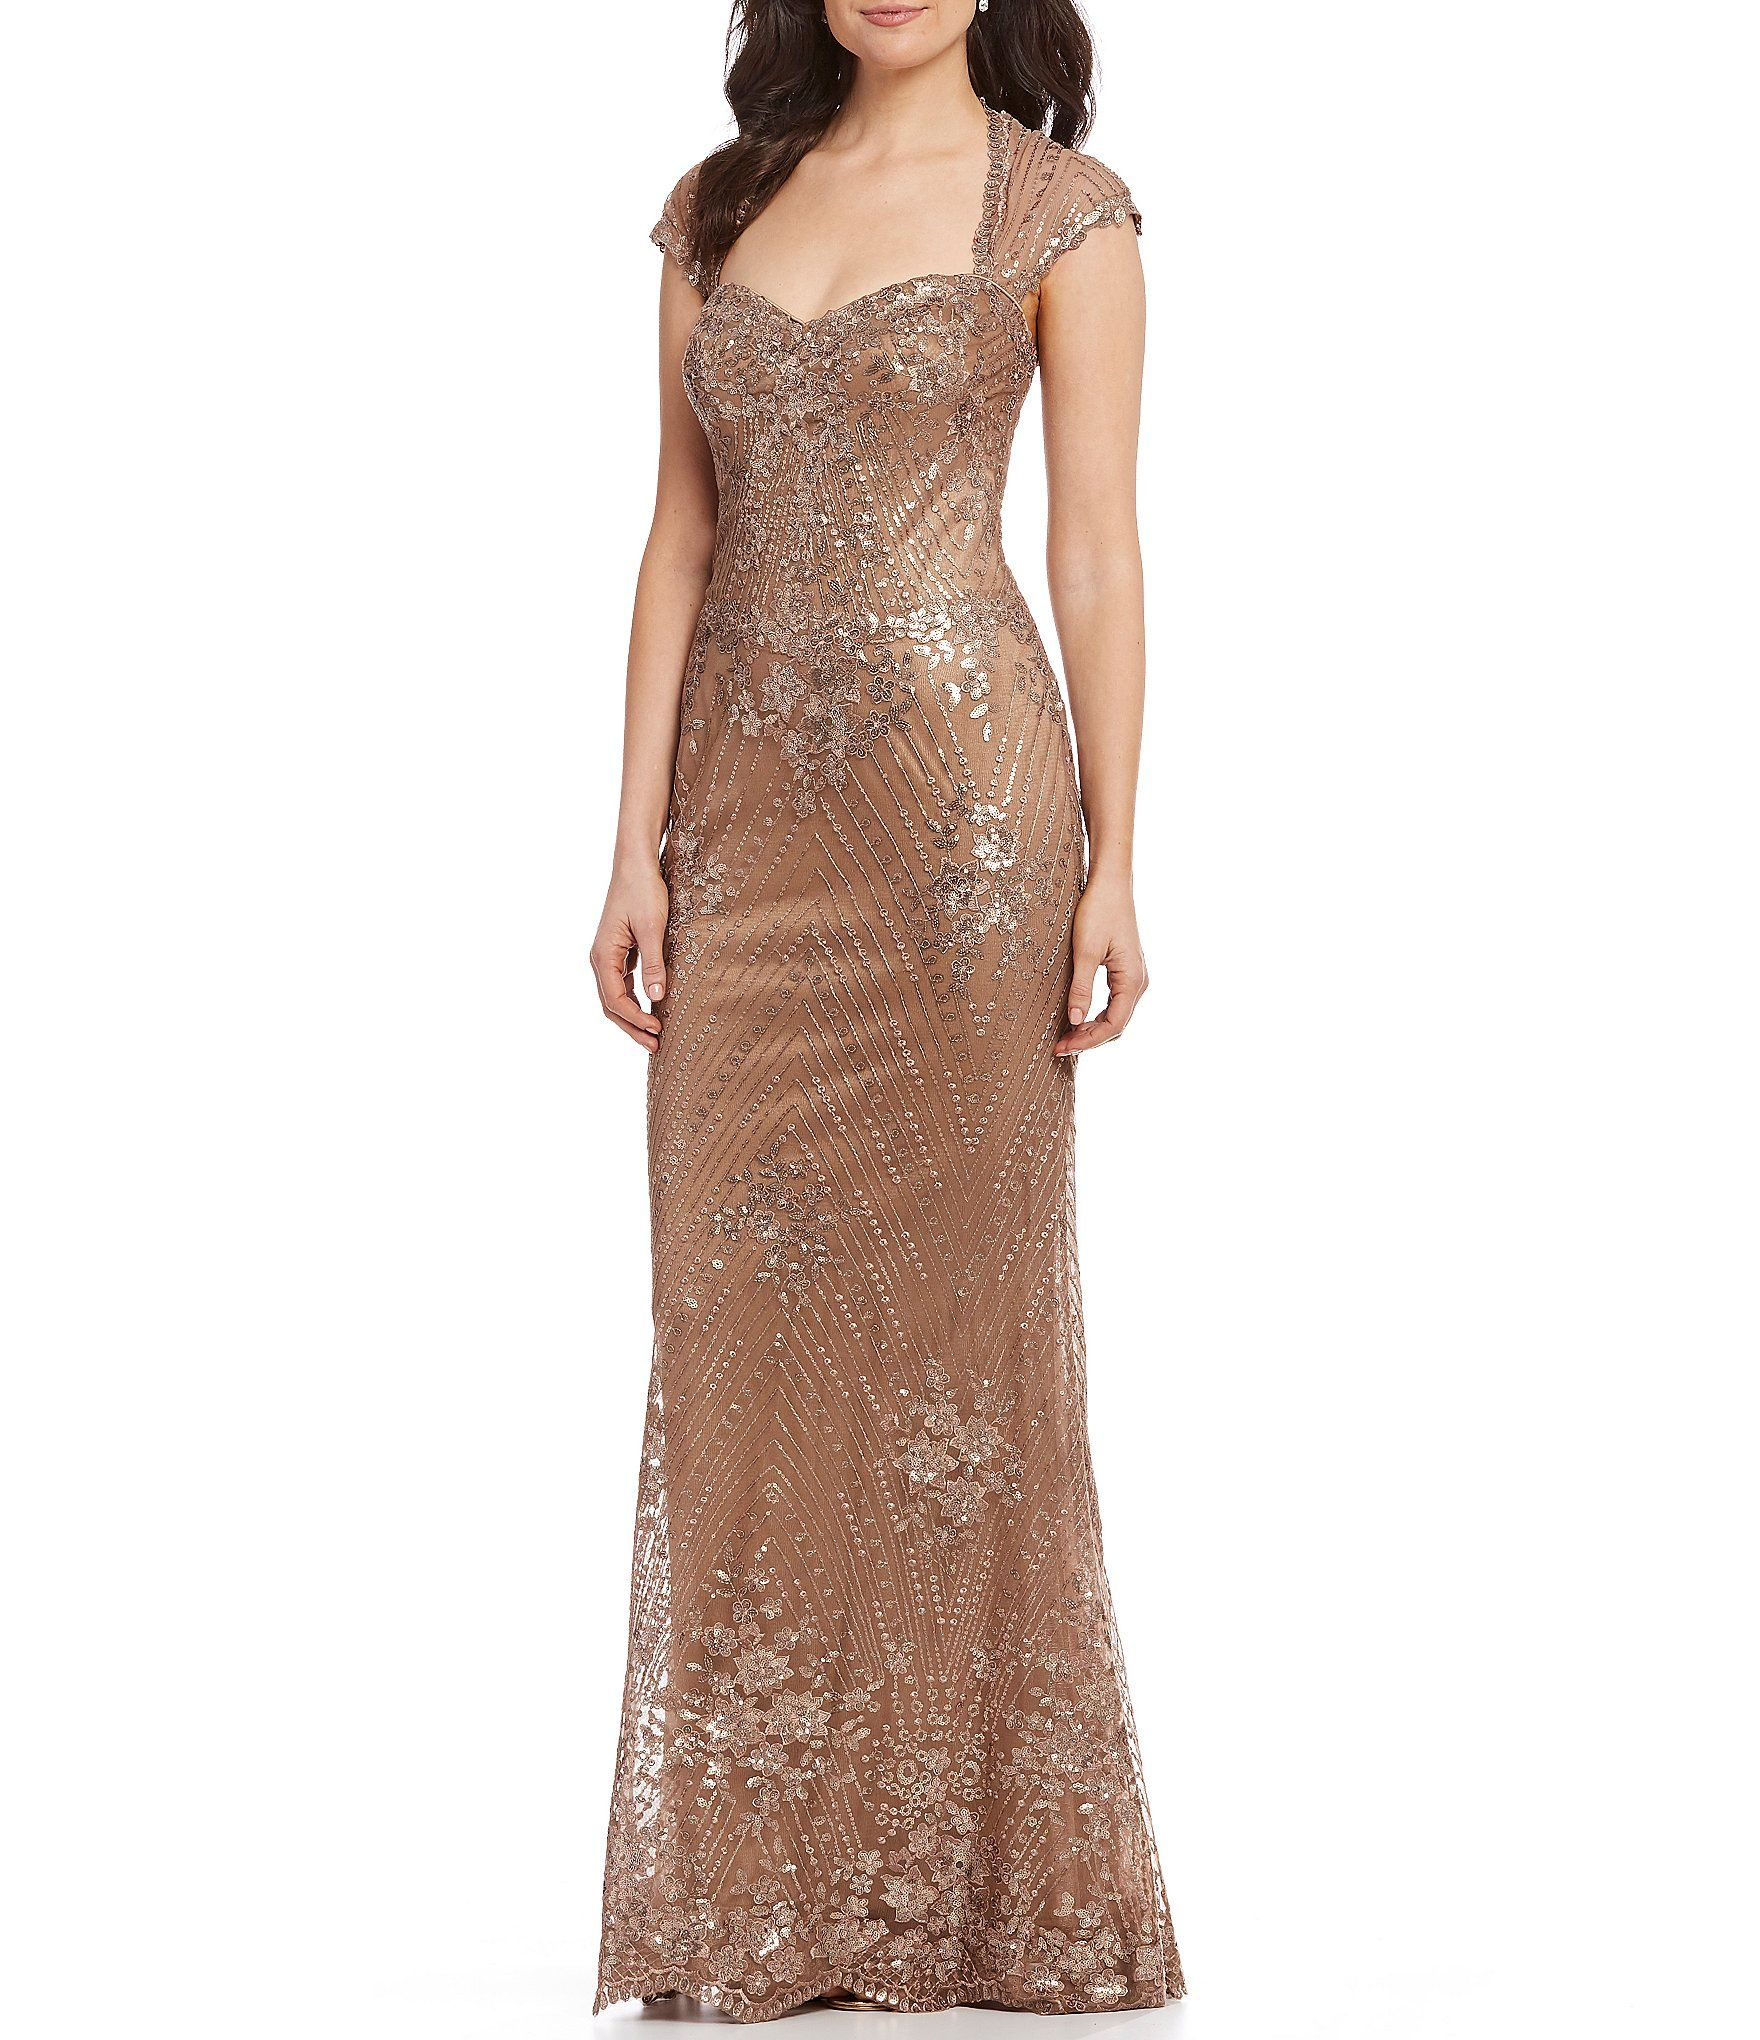 Shop for mon cheri metallic sequin lace mermaid gown at dillards